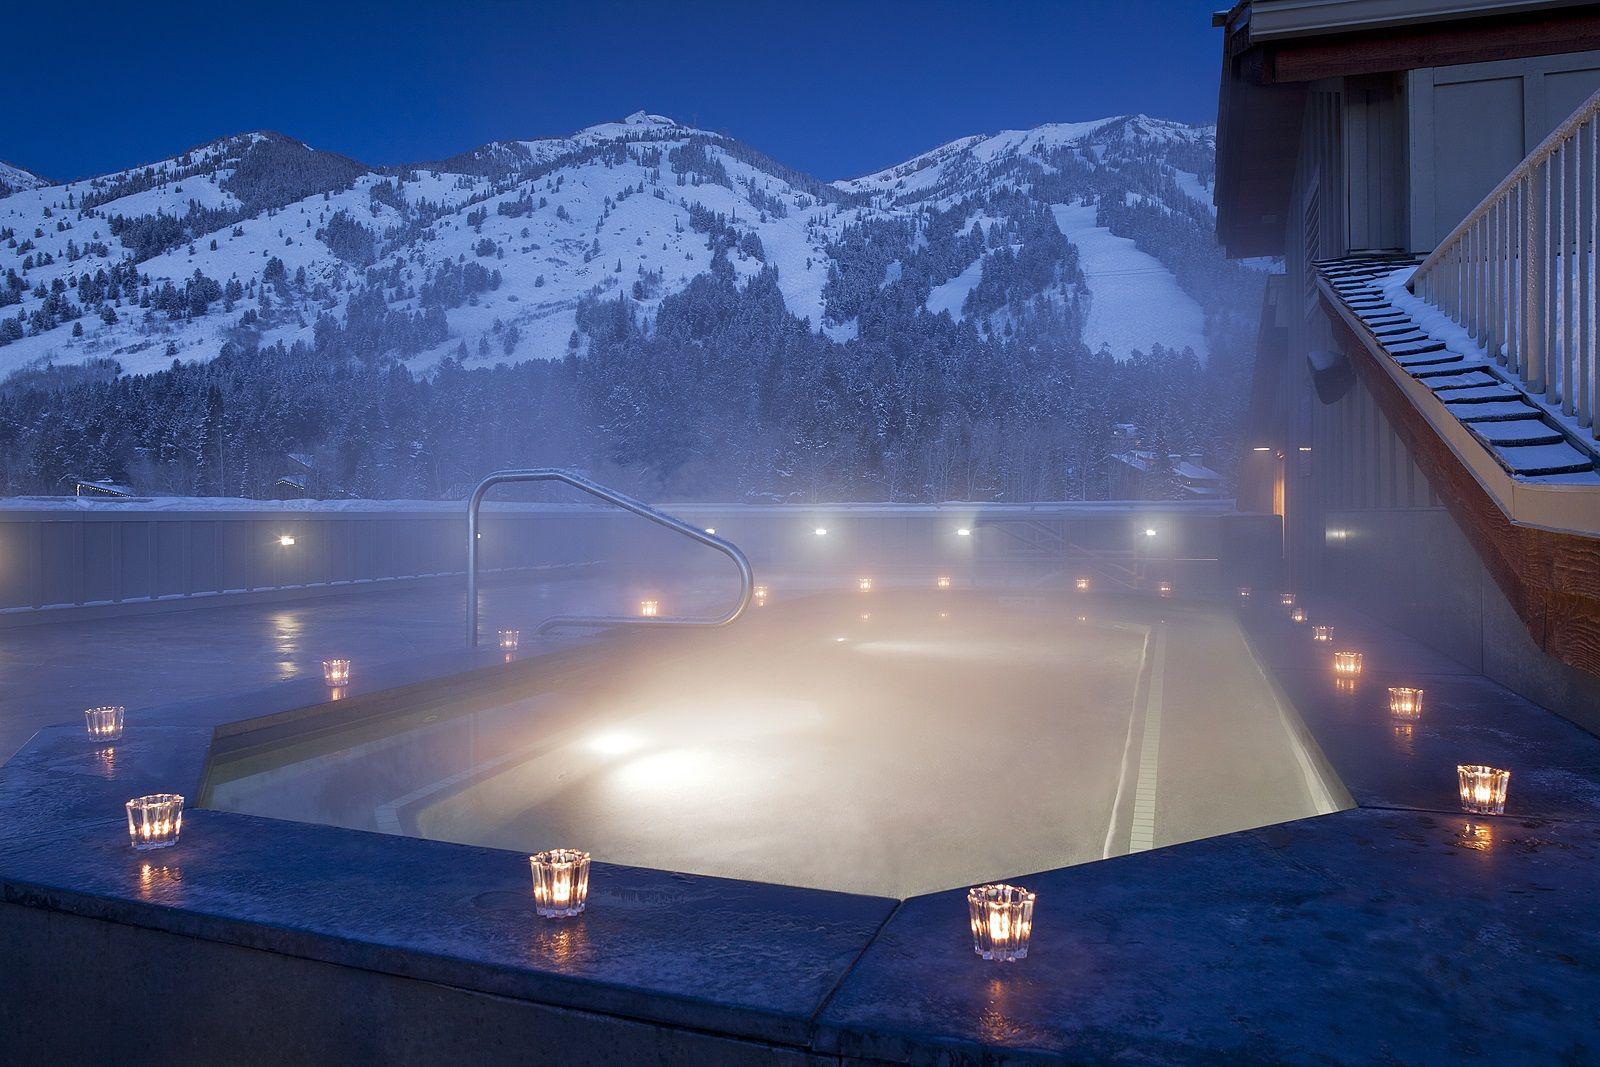 Rocky Mountain Hotels That Promise A Winter Wonderland Best Spahot Tubsmountain